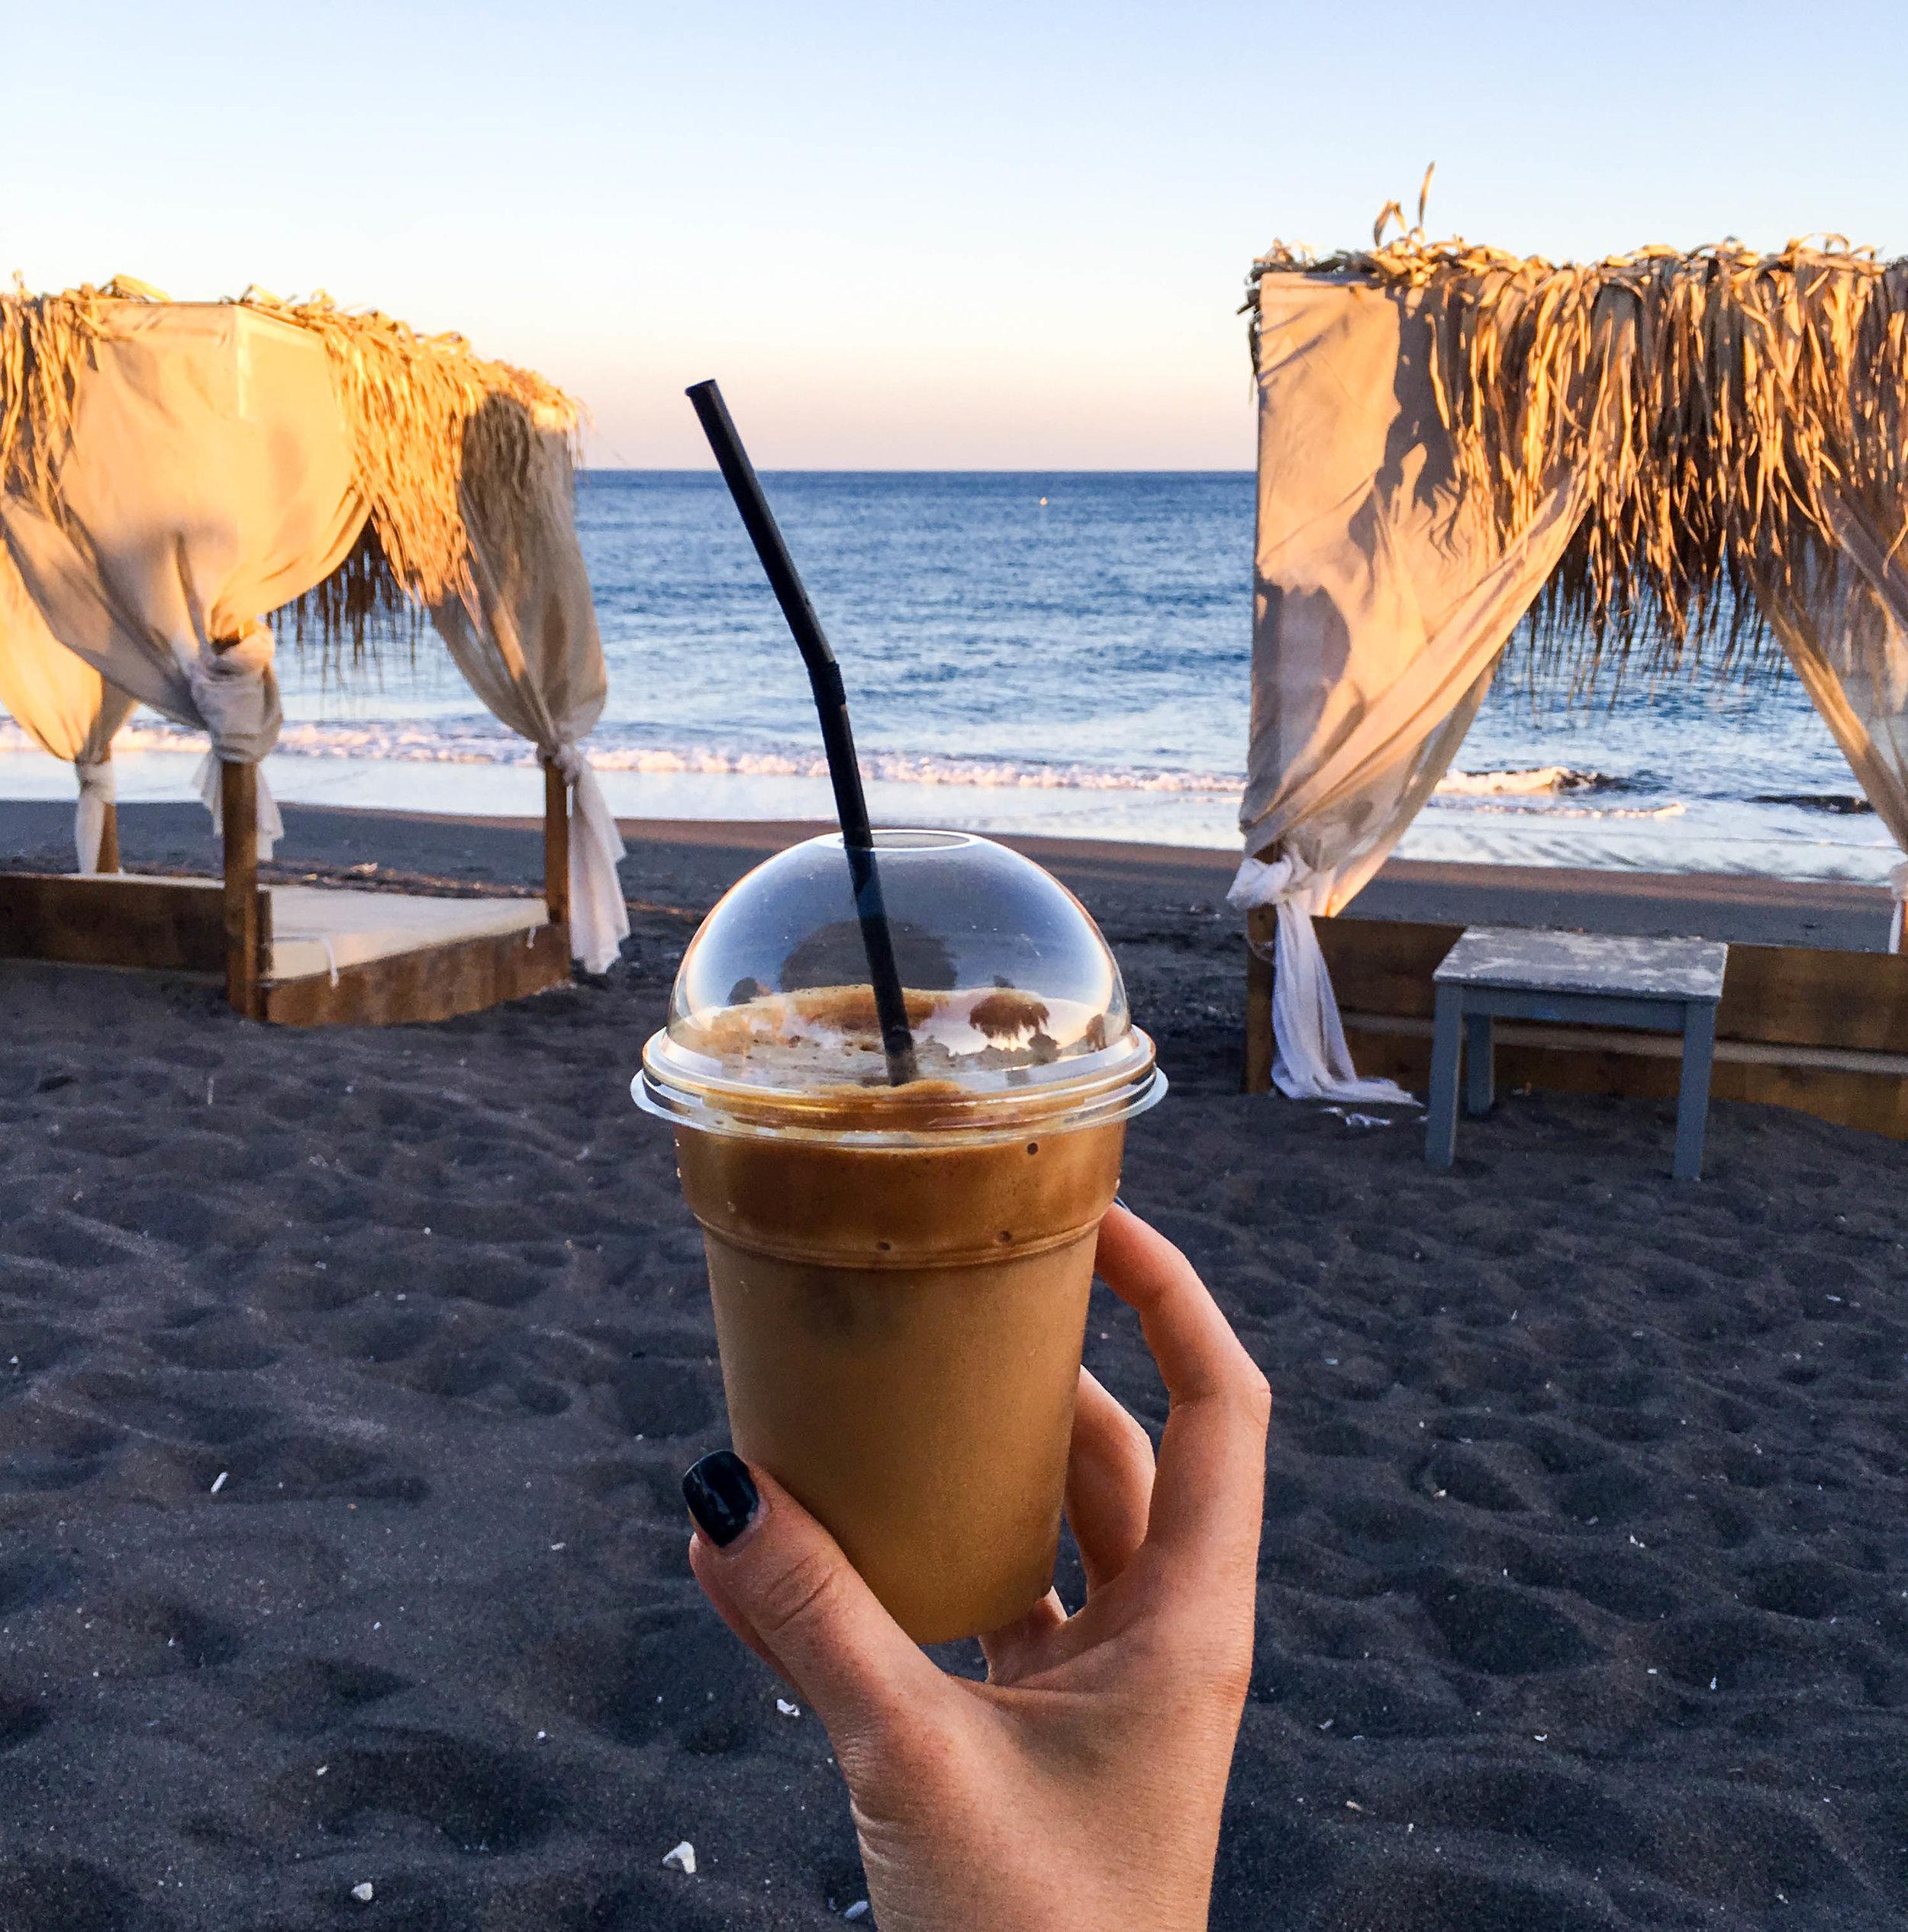 Enjoying a Greek frappe on the black sand beach of Perissa, Santorini, Greece